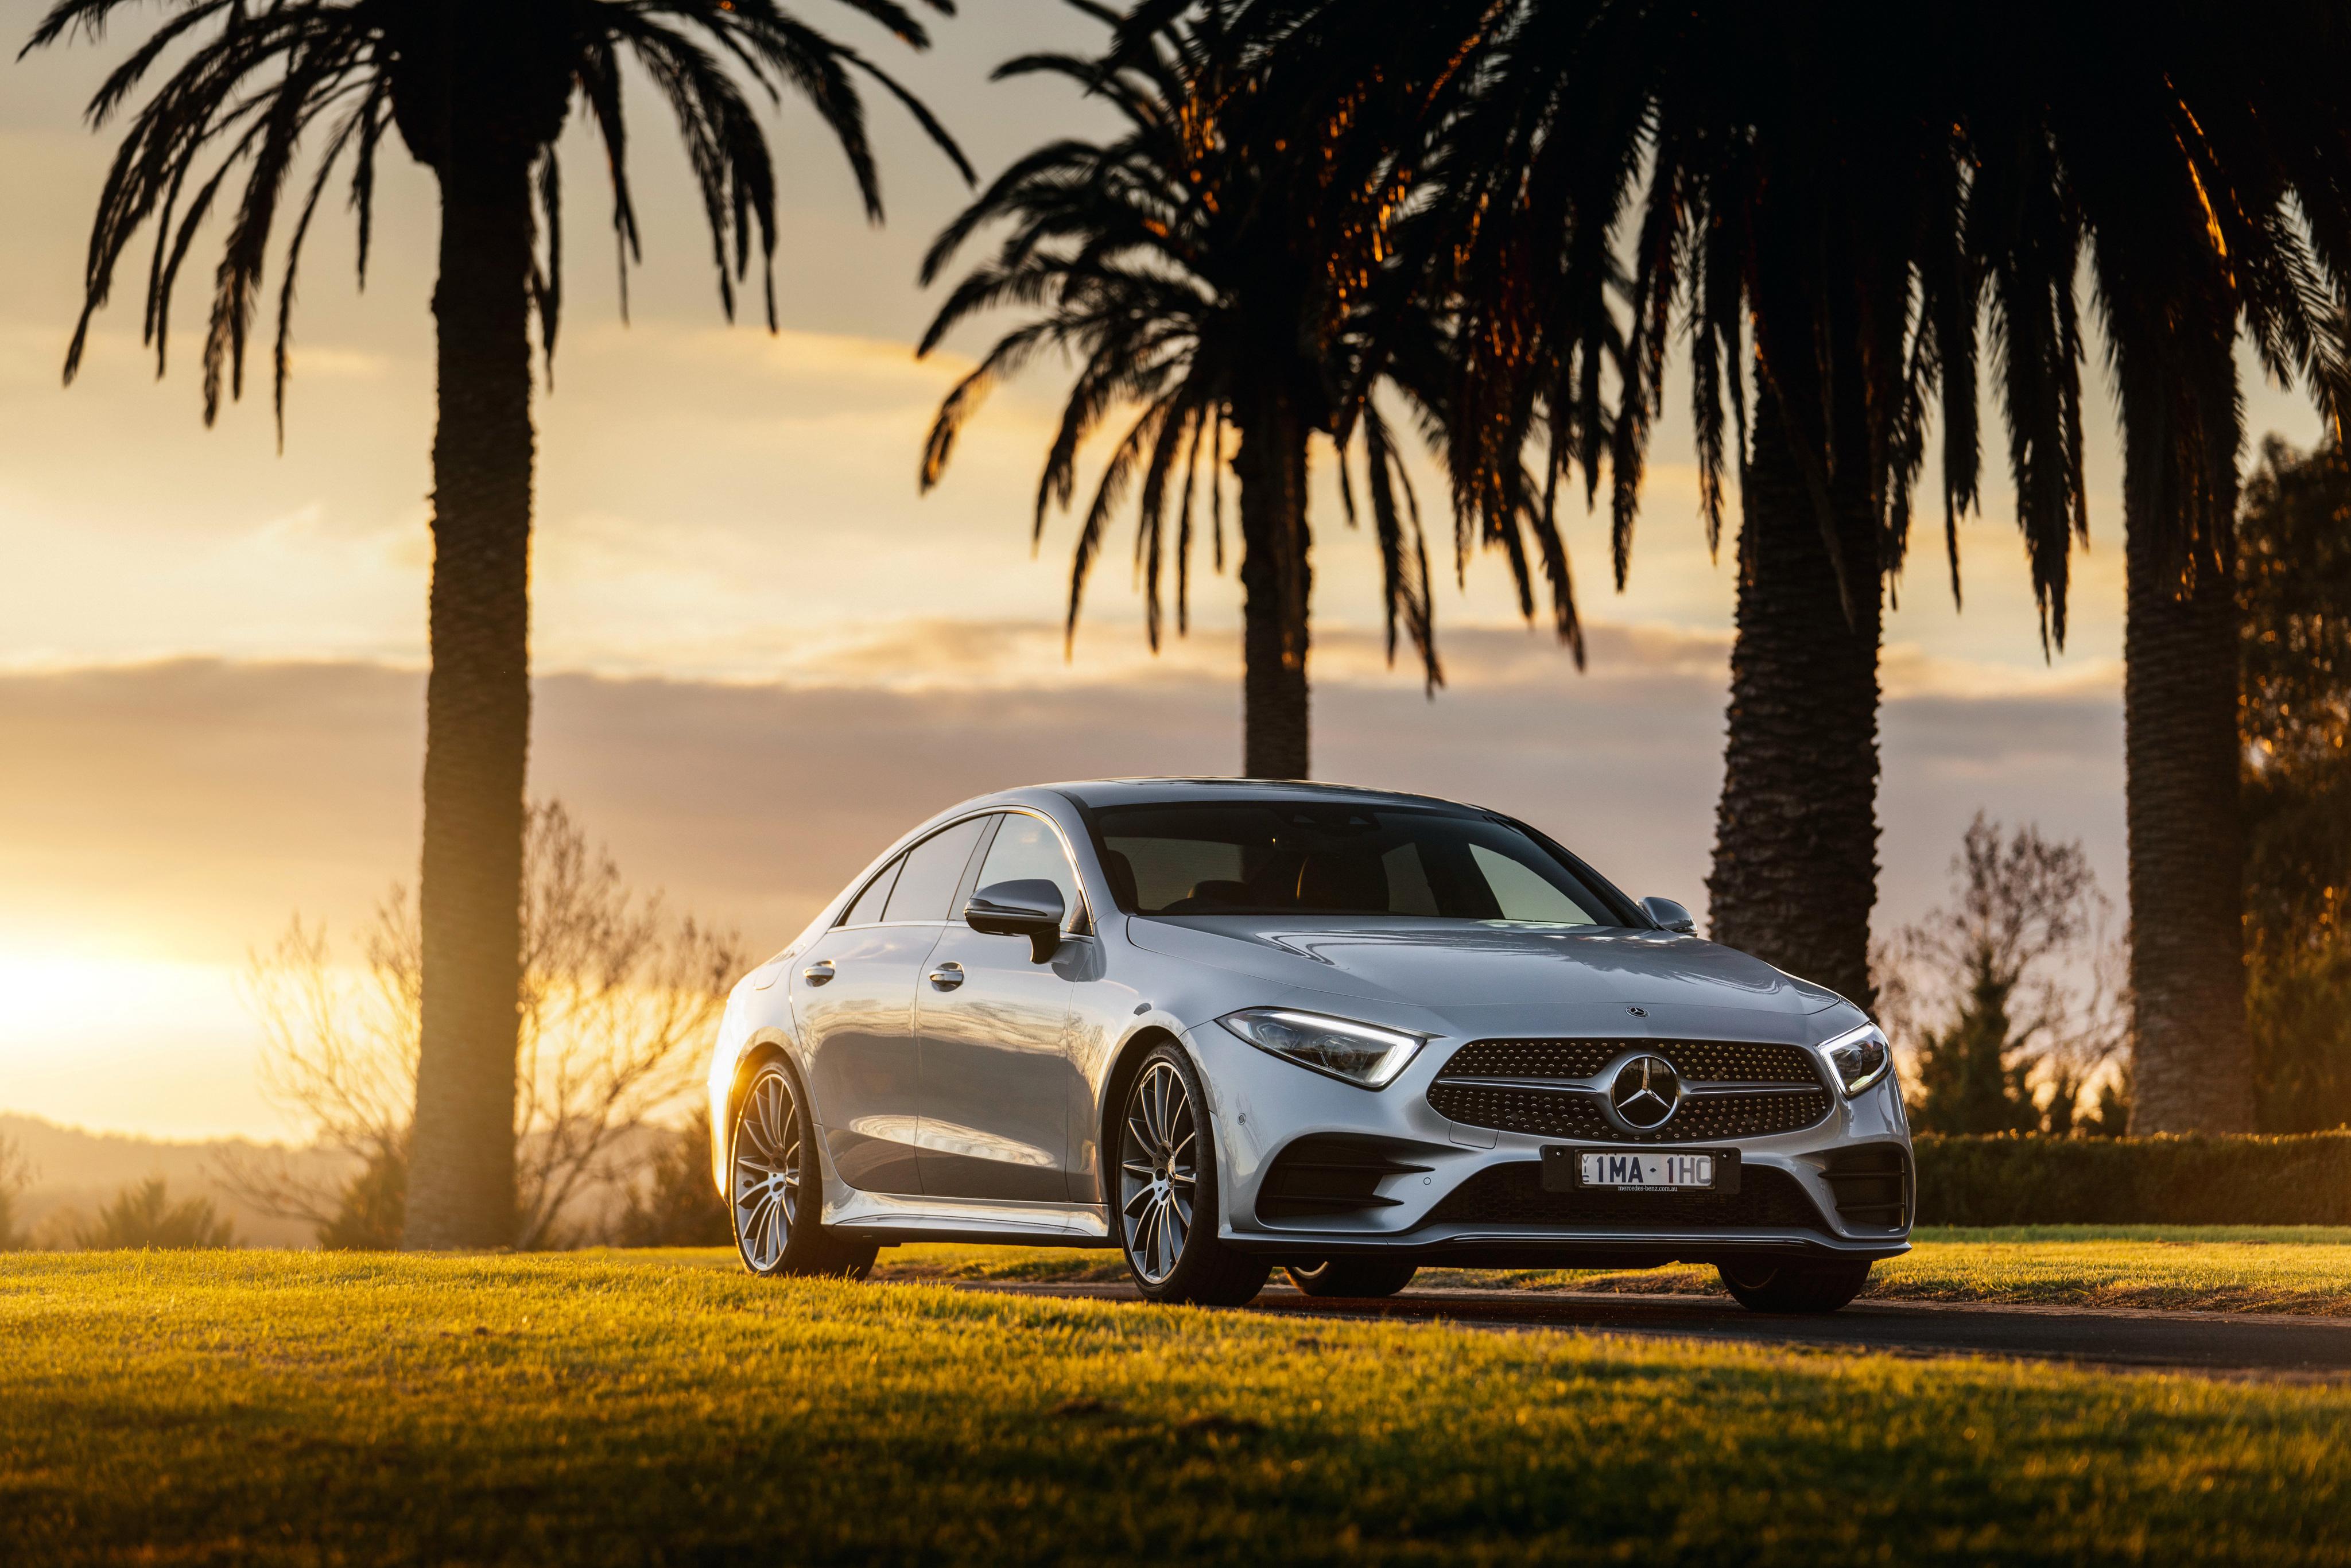 Mercedes Benz CLS 450 4MATIC AMG Line 2018, HD Cars, 4k